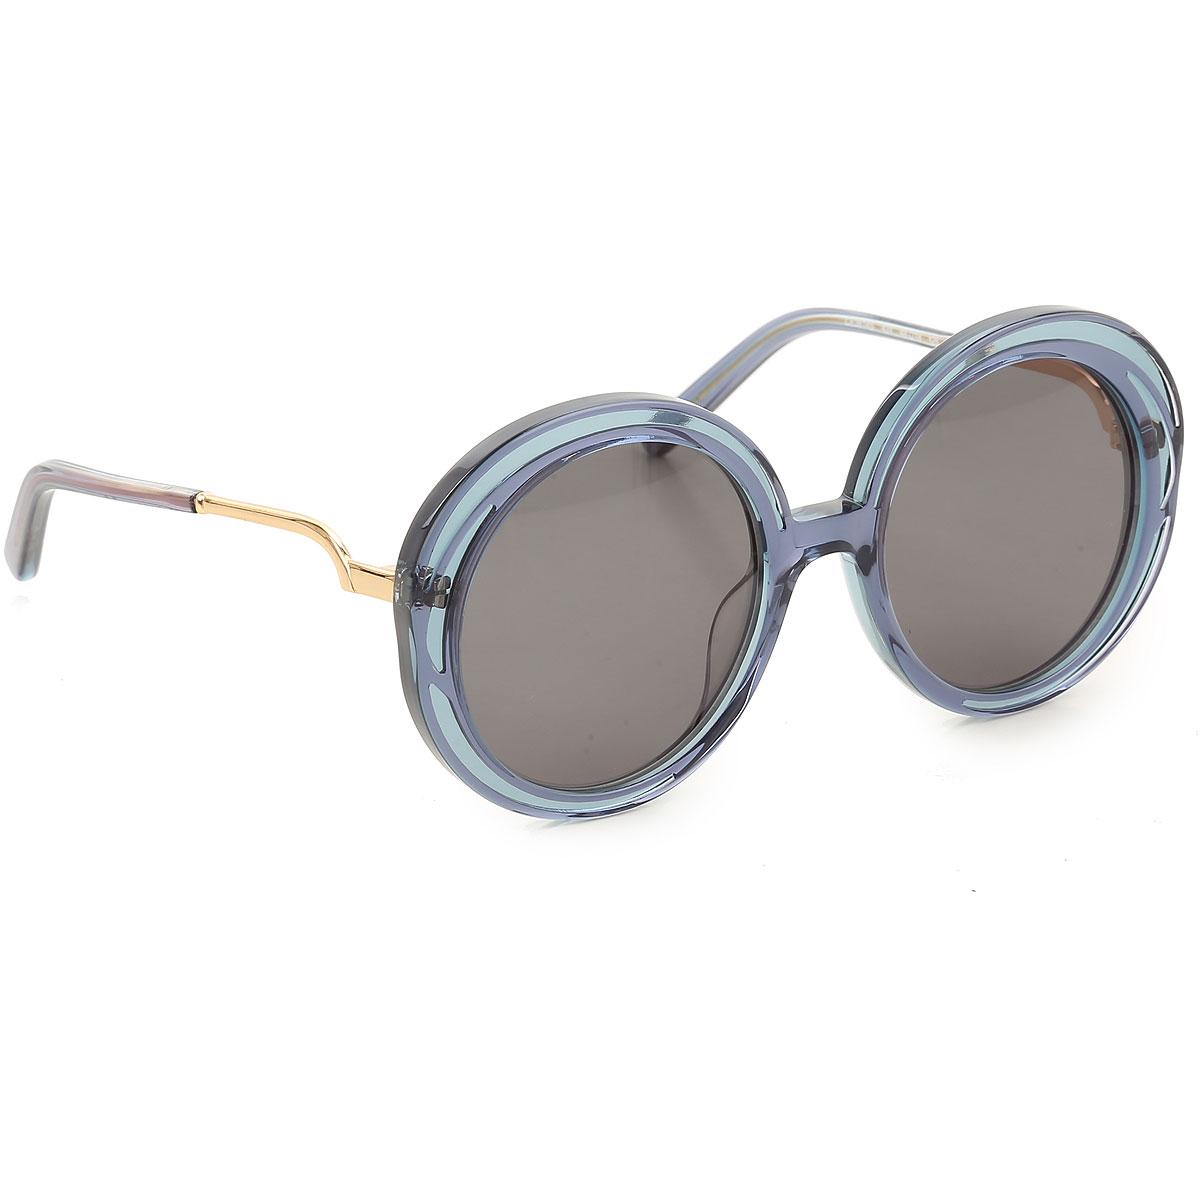 Image of Chloe Kids Sunglasses for Girls On Sale, Blue, 2017